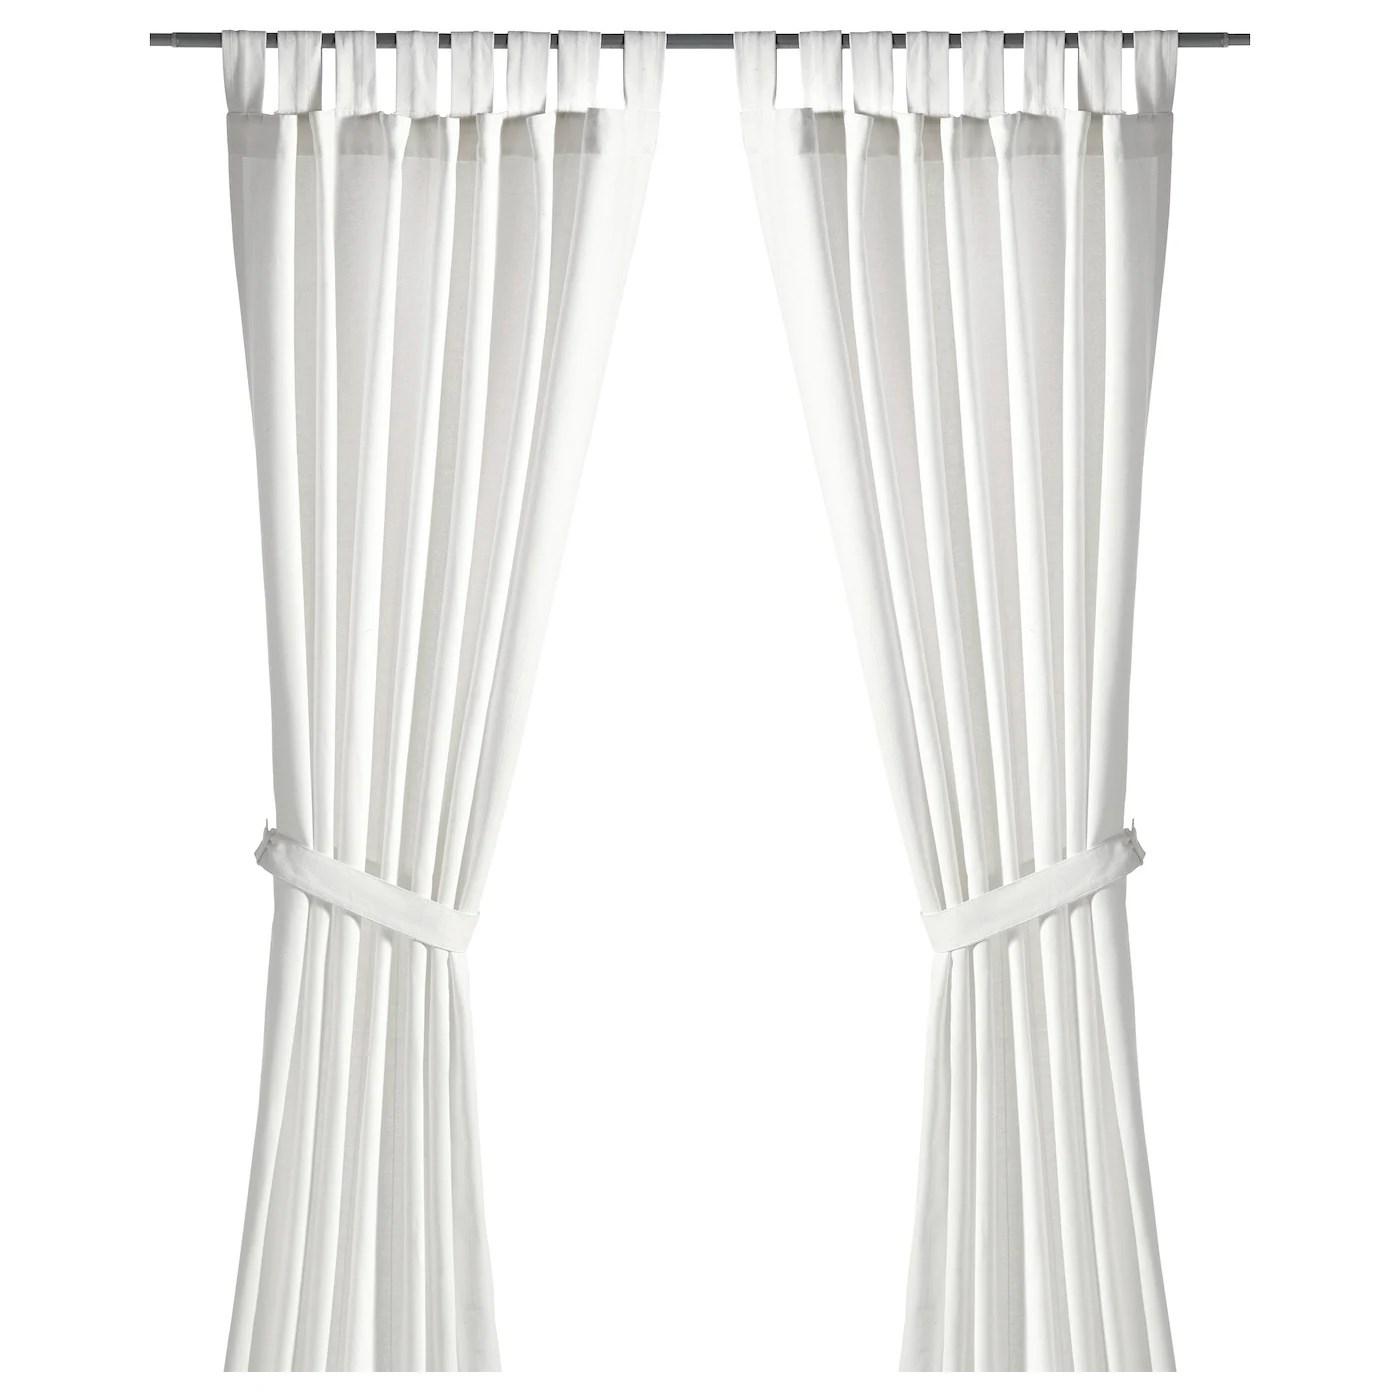 lenda curtains with tie backs 1 pair white 55x98